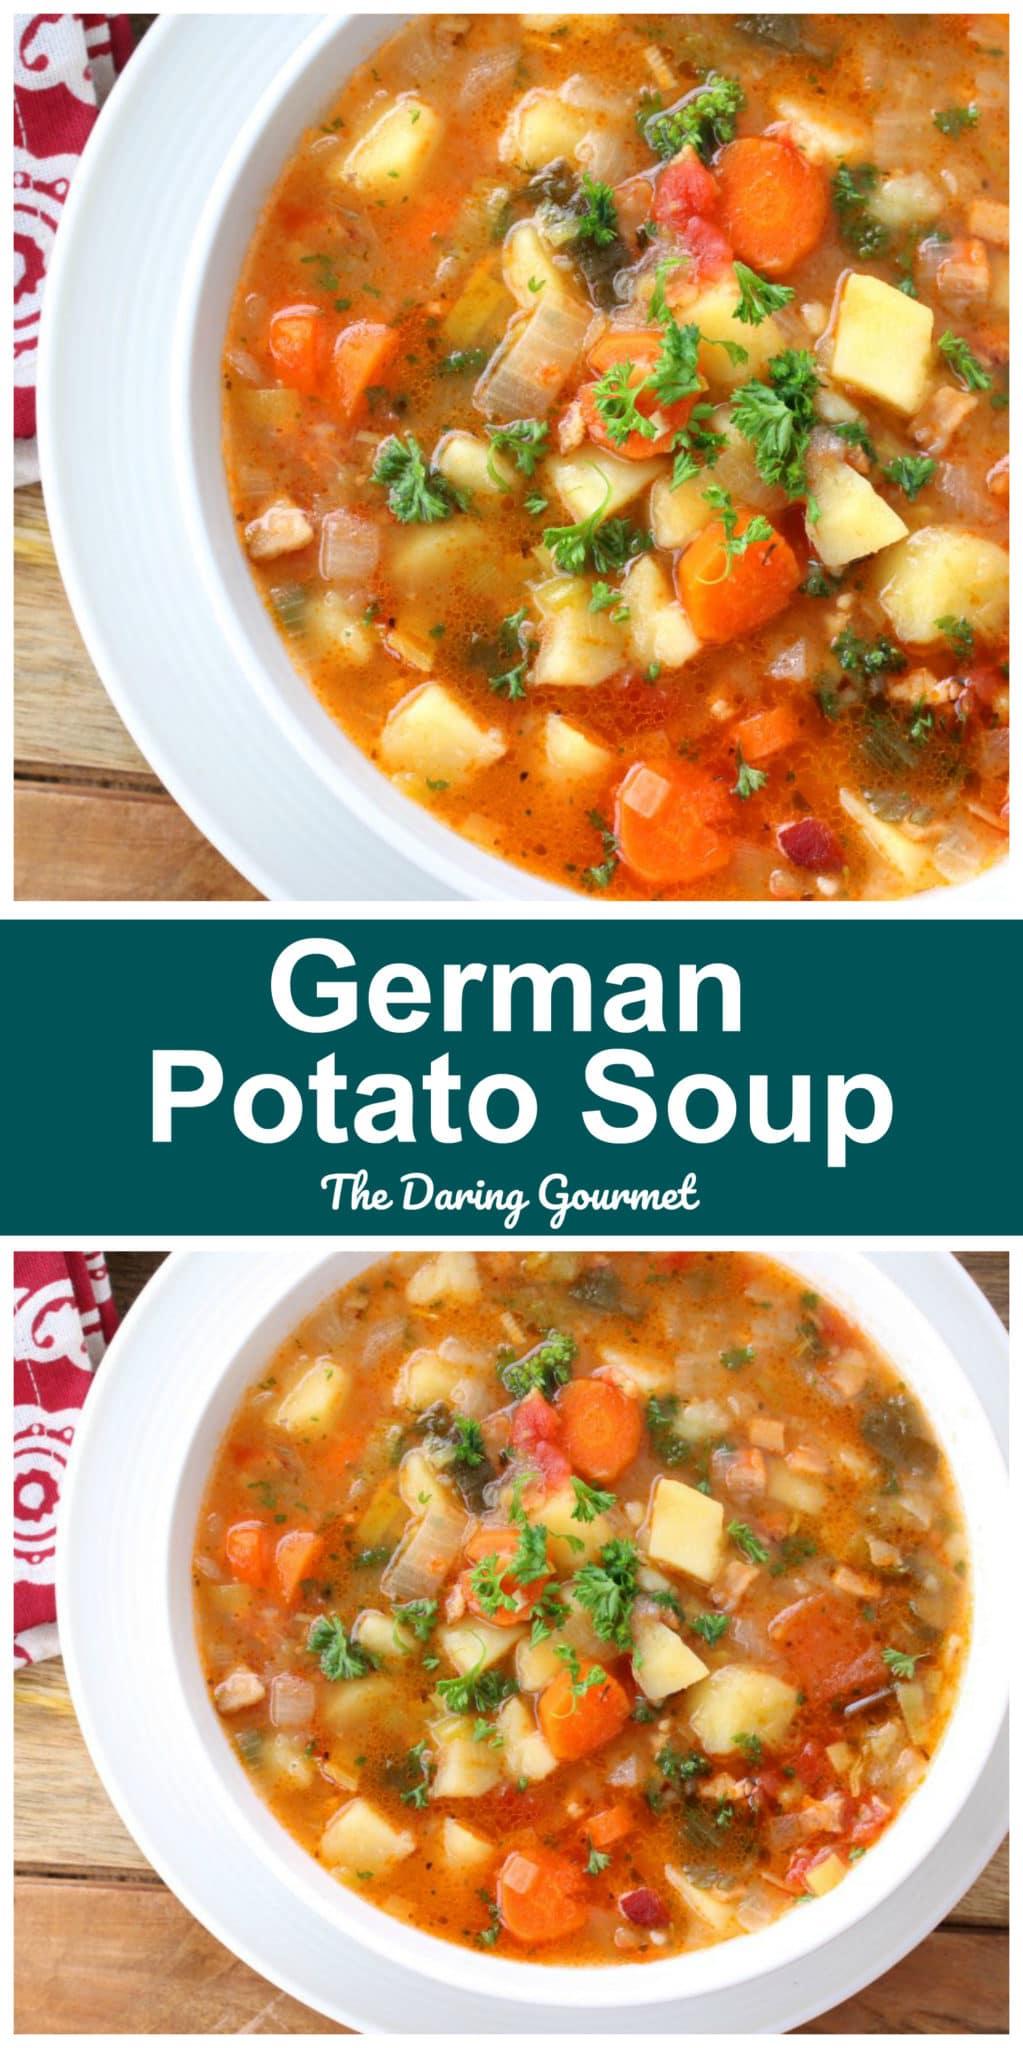 potato soup recipe best german traditional authentic